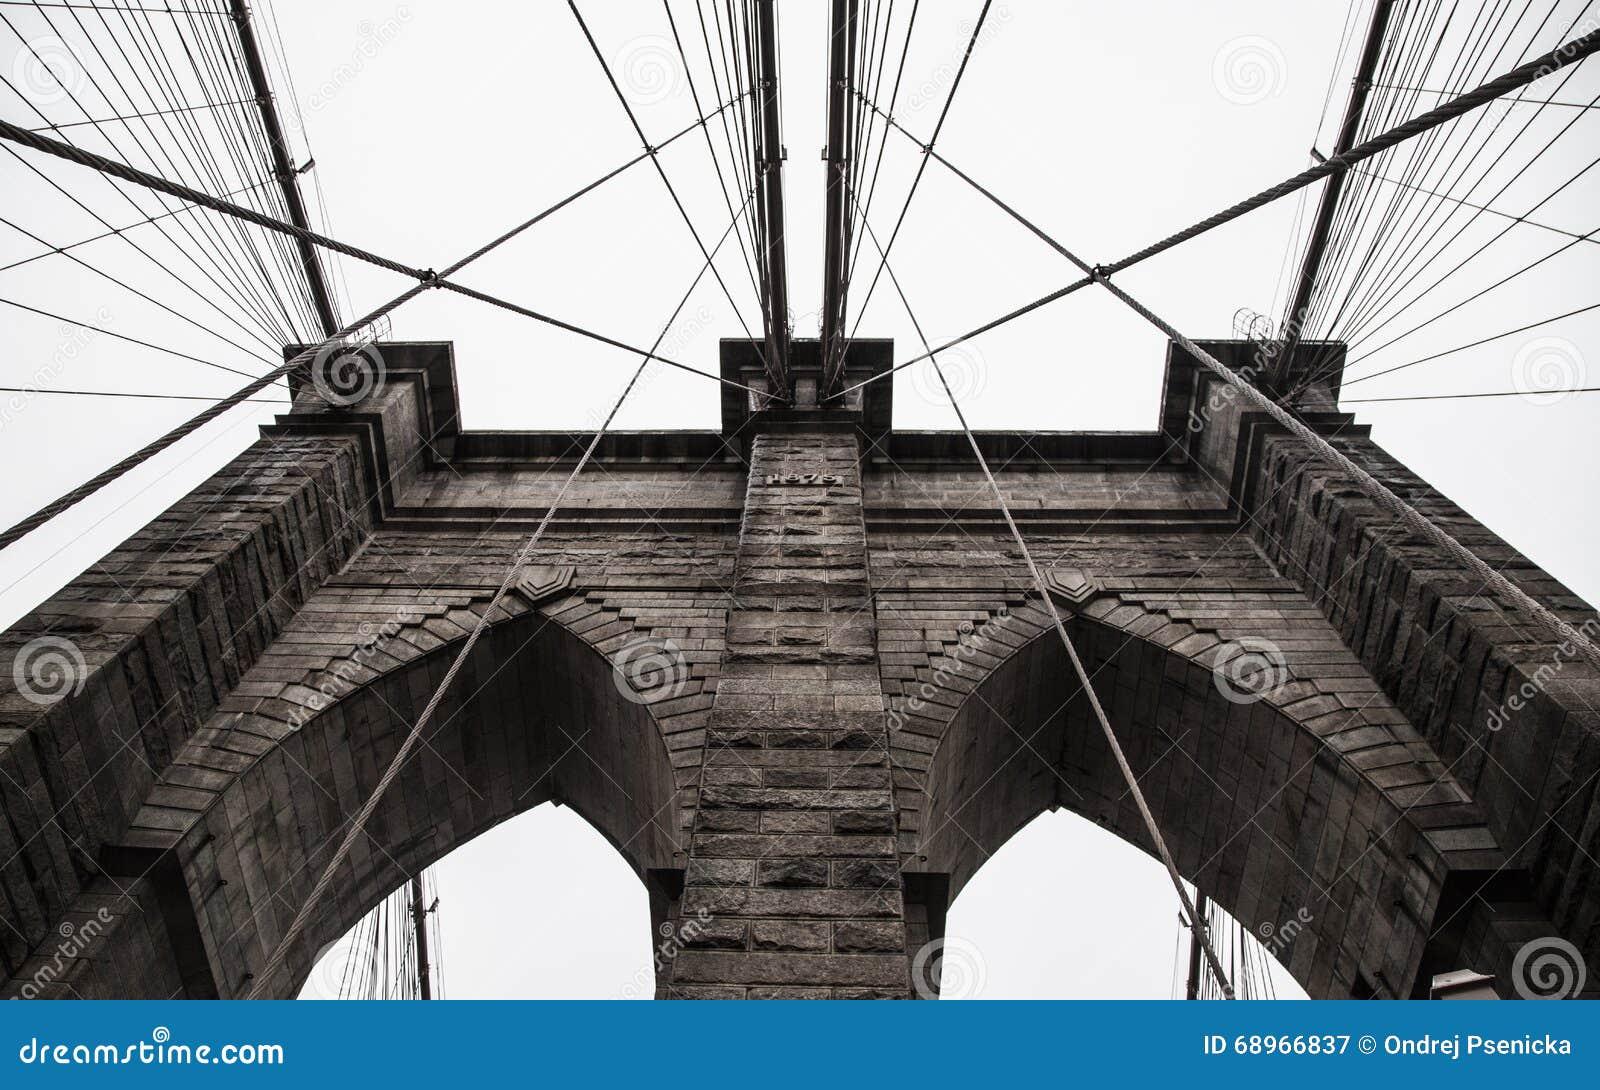 Brooklyn Bridge In New York City Stock Image Image Of Sights Brooklyn 68966837